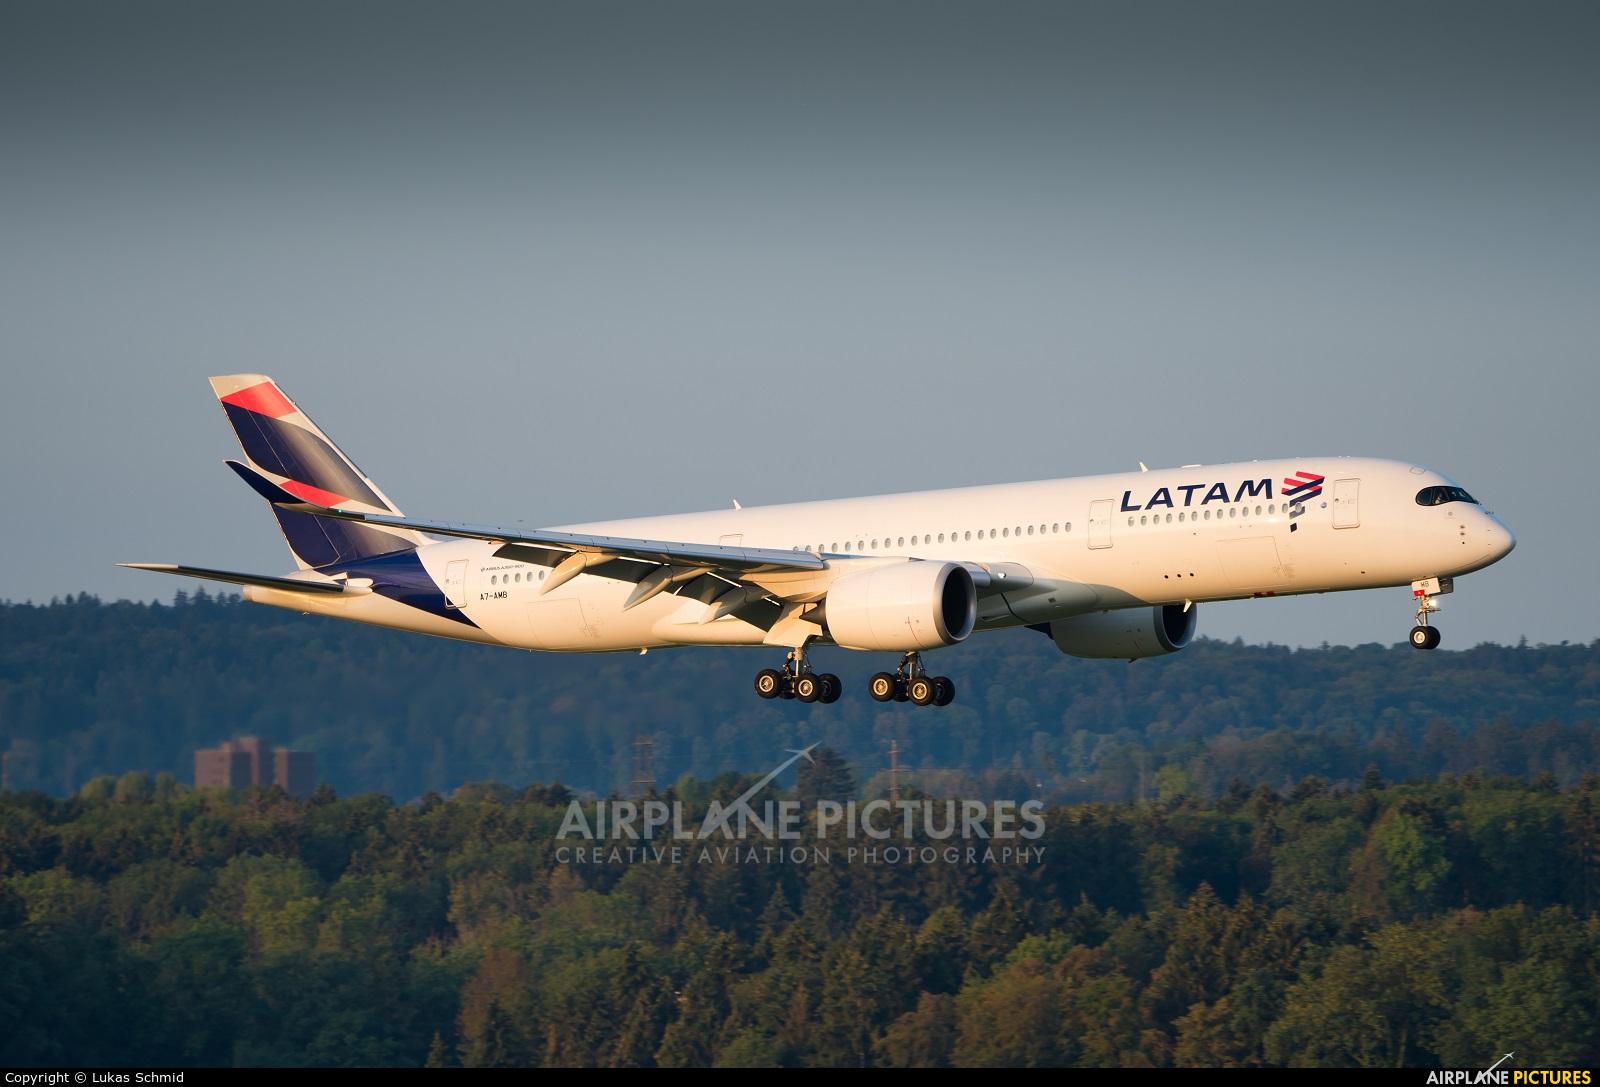 LATAM A7-AMB aircraft at Zurich